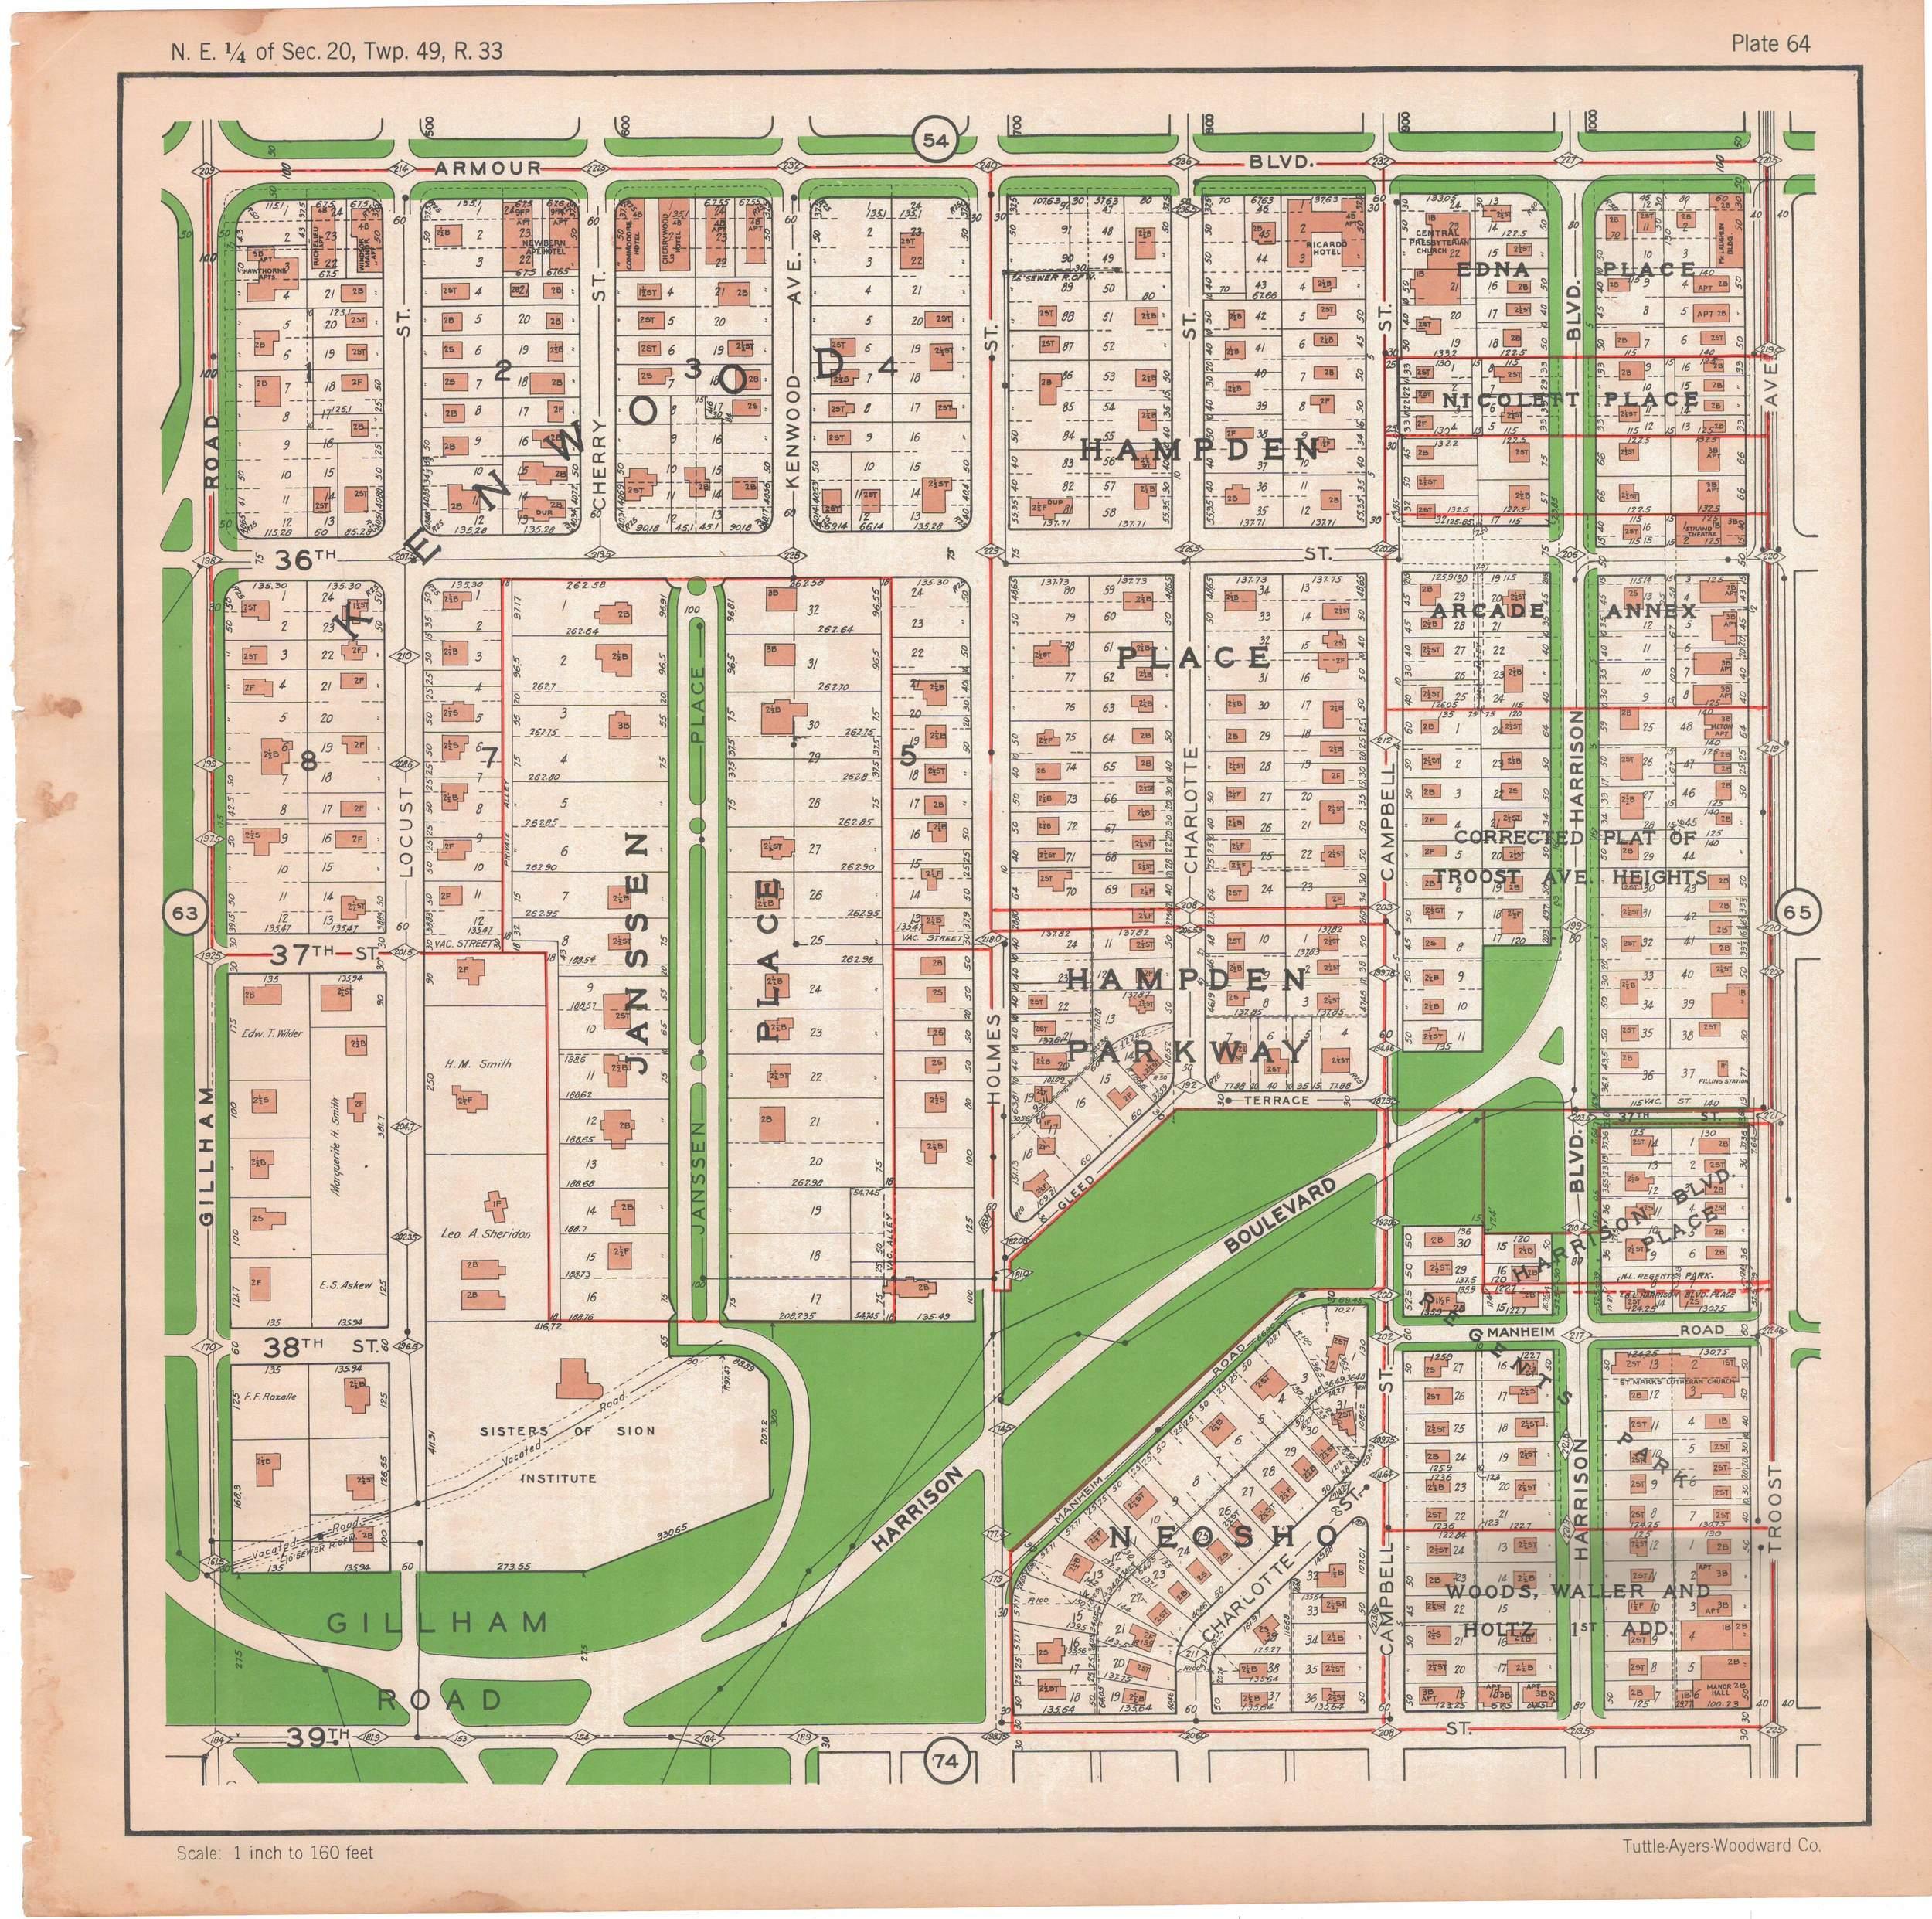 1925 TUTTLE_AYERS_Plate 64.JPG